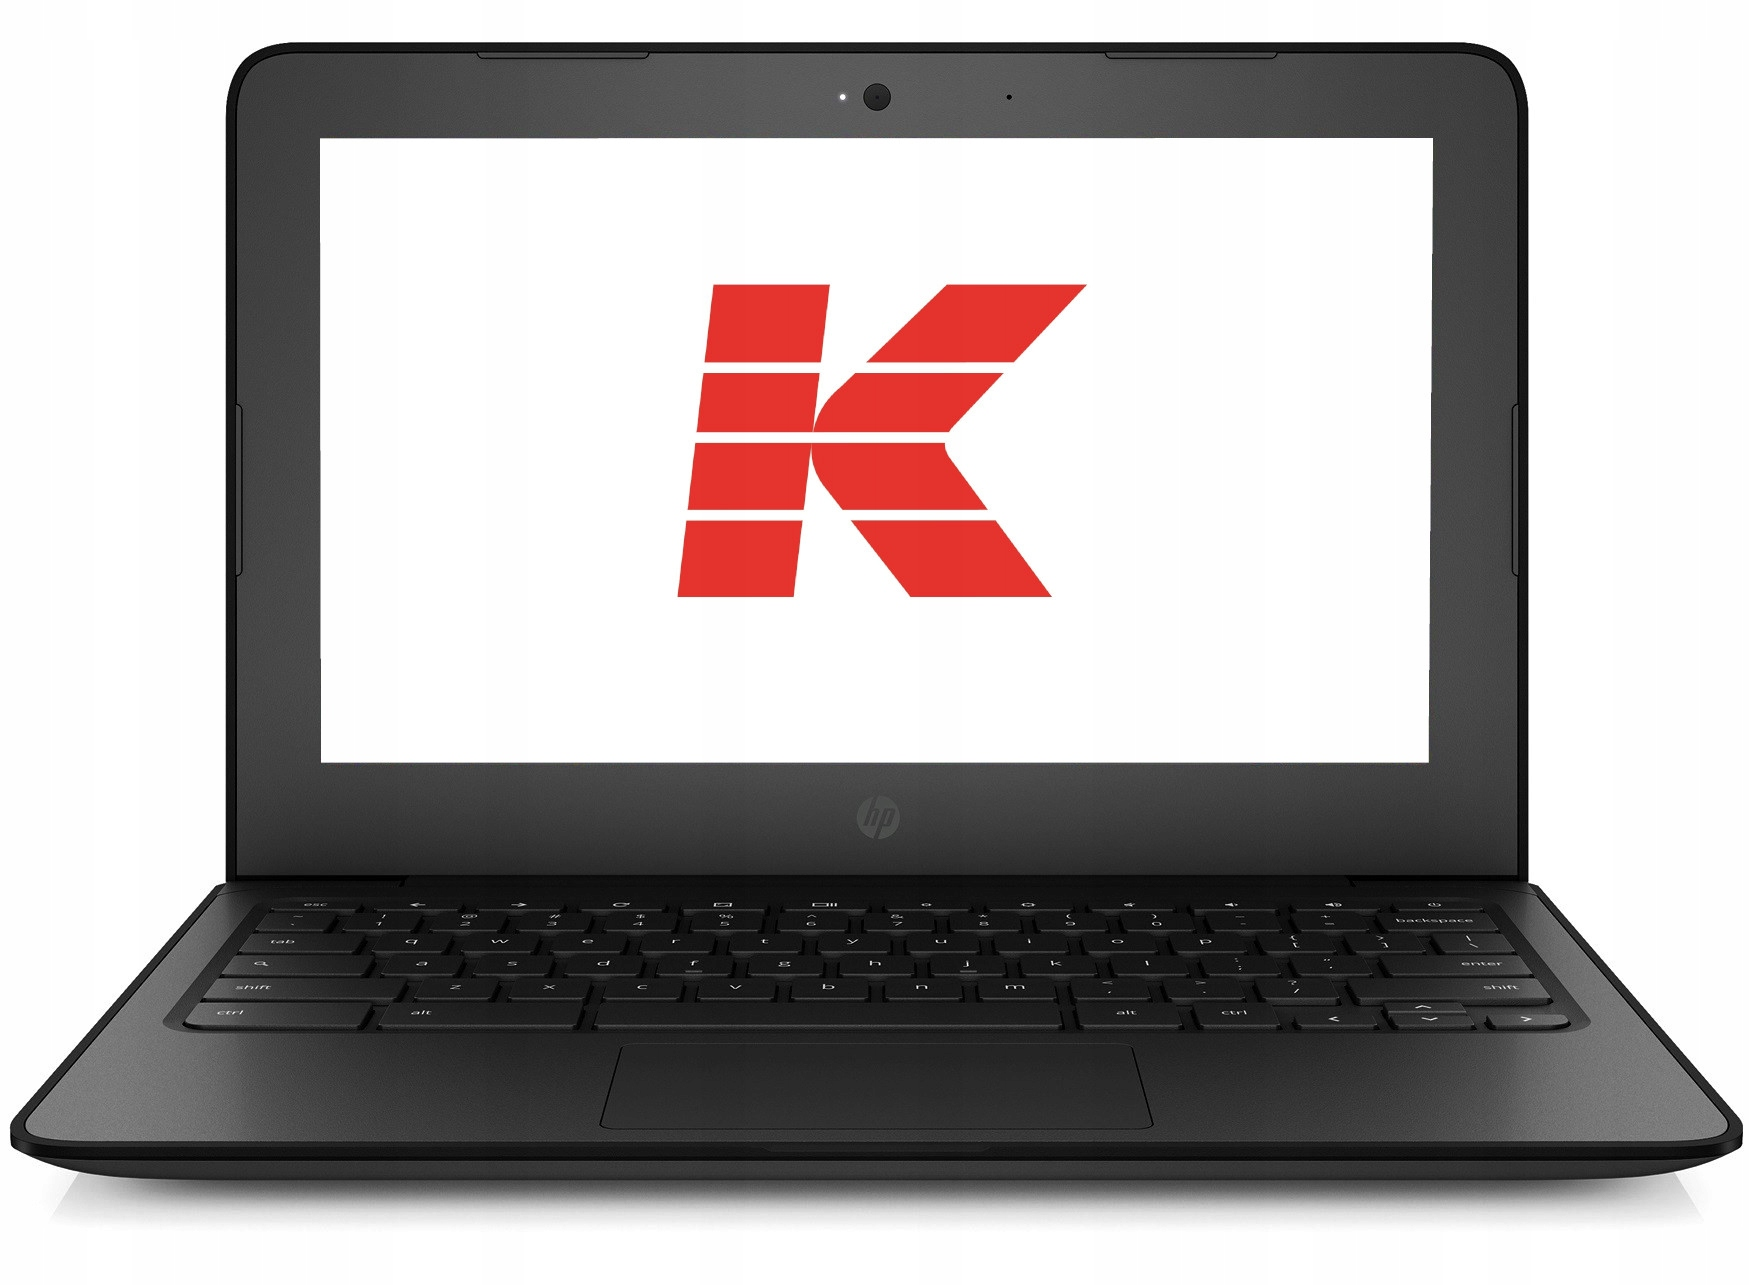 DELL Chromebook 11 4GB HDMI SSD USB 3.0 MOCNA BAT Pojemność dysku 16 GB